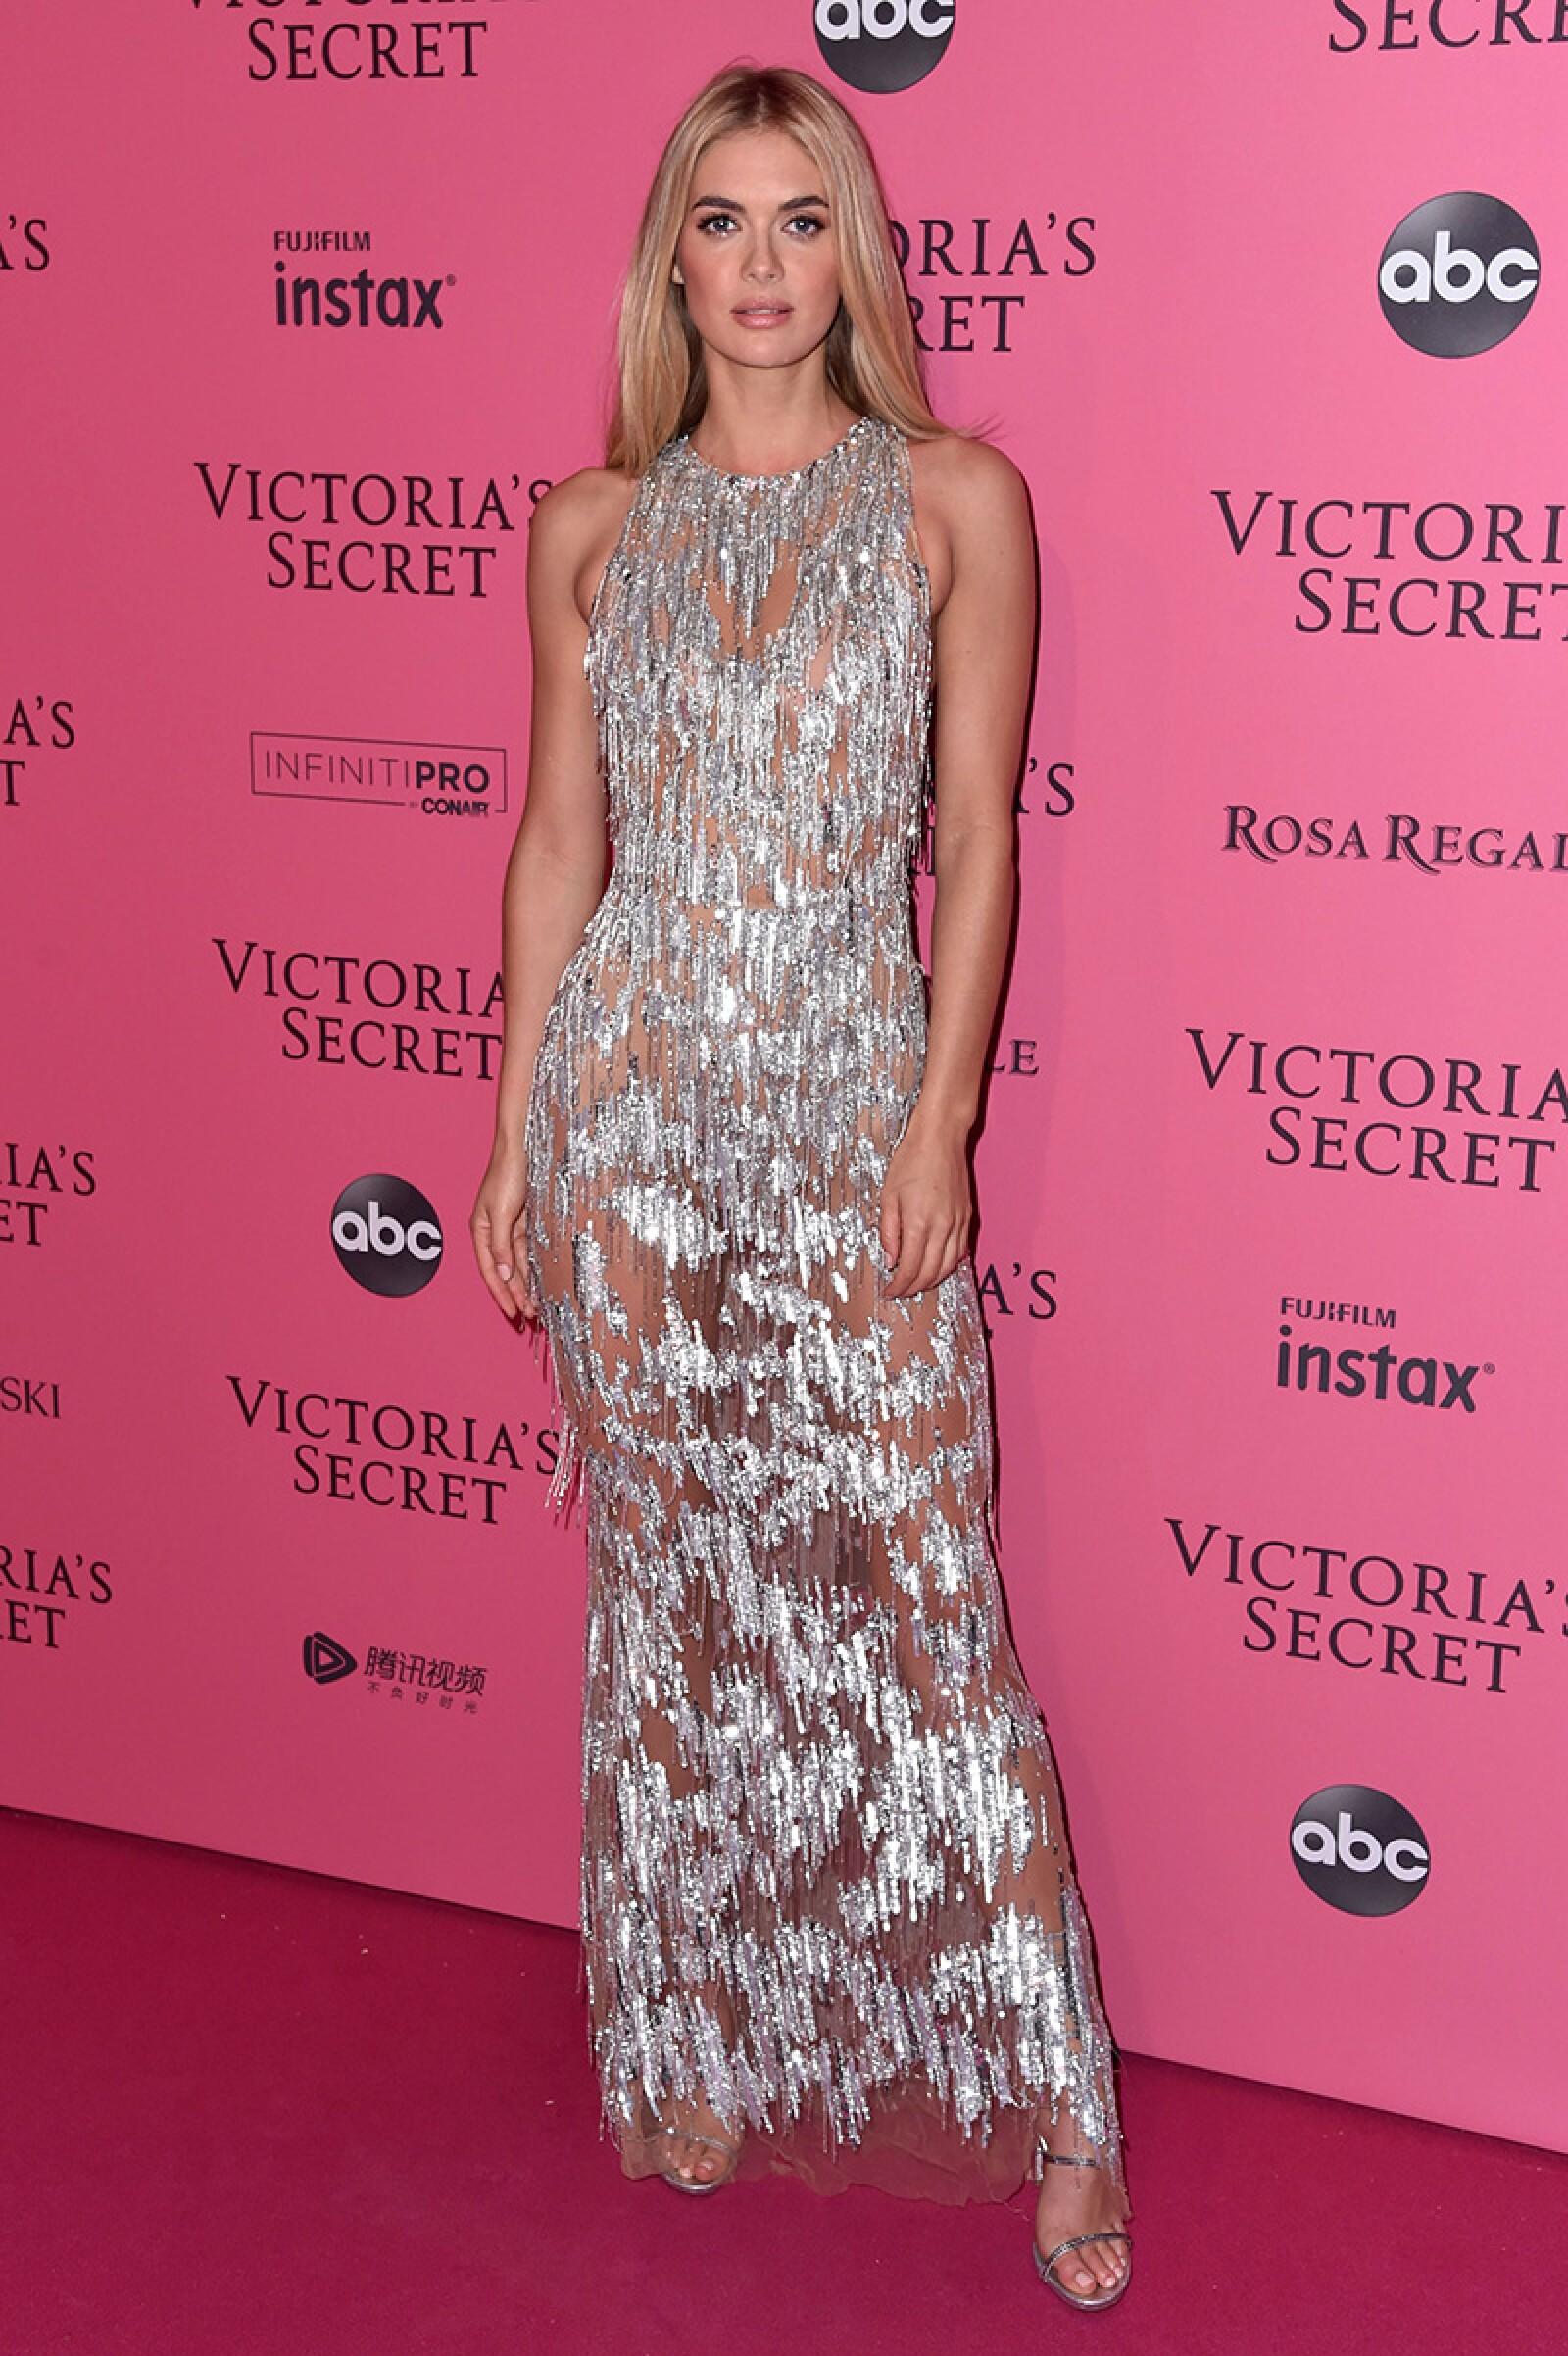 Victoria's Secret Fashion Show, Pink Carpet Arrivals, After Party, New York, USA - 08 Nov 2018